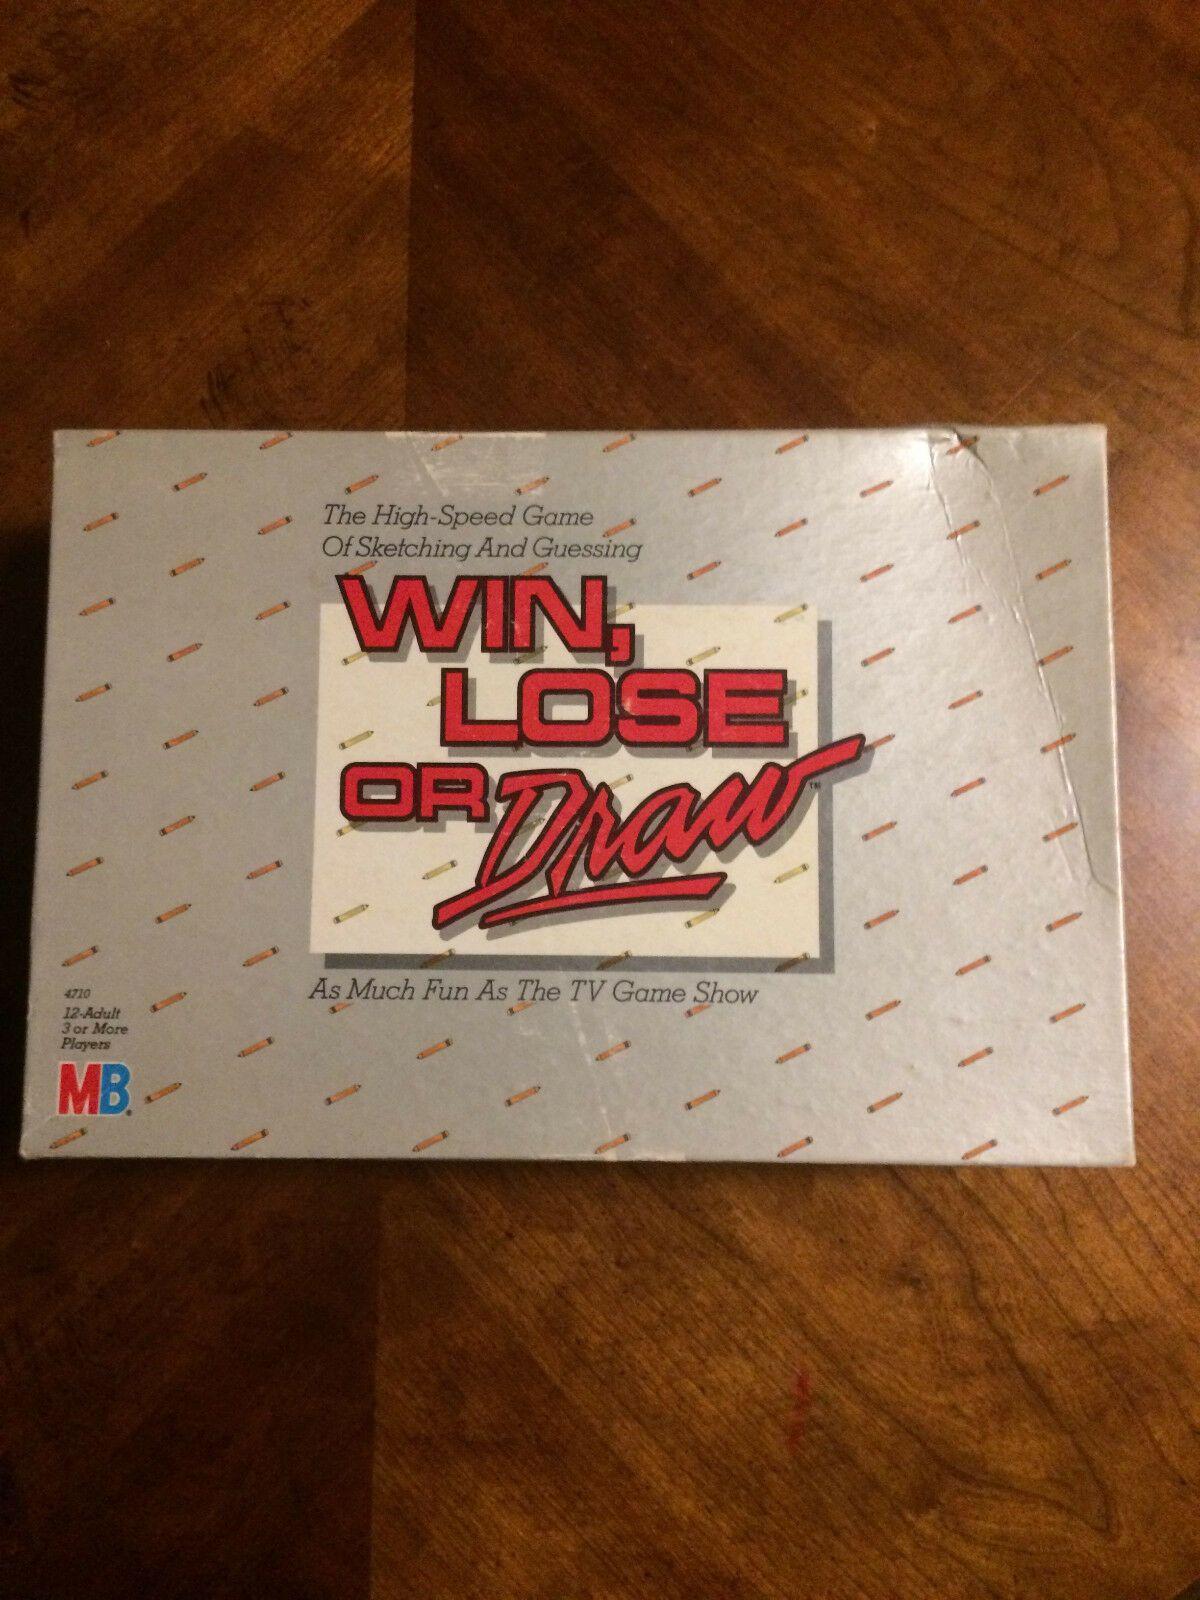 Details about Vintage 1987 Milton Bradley Win, Lose or